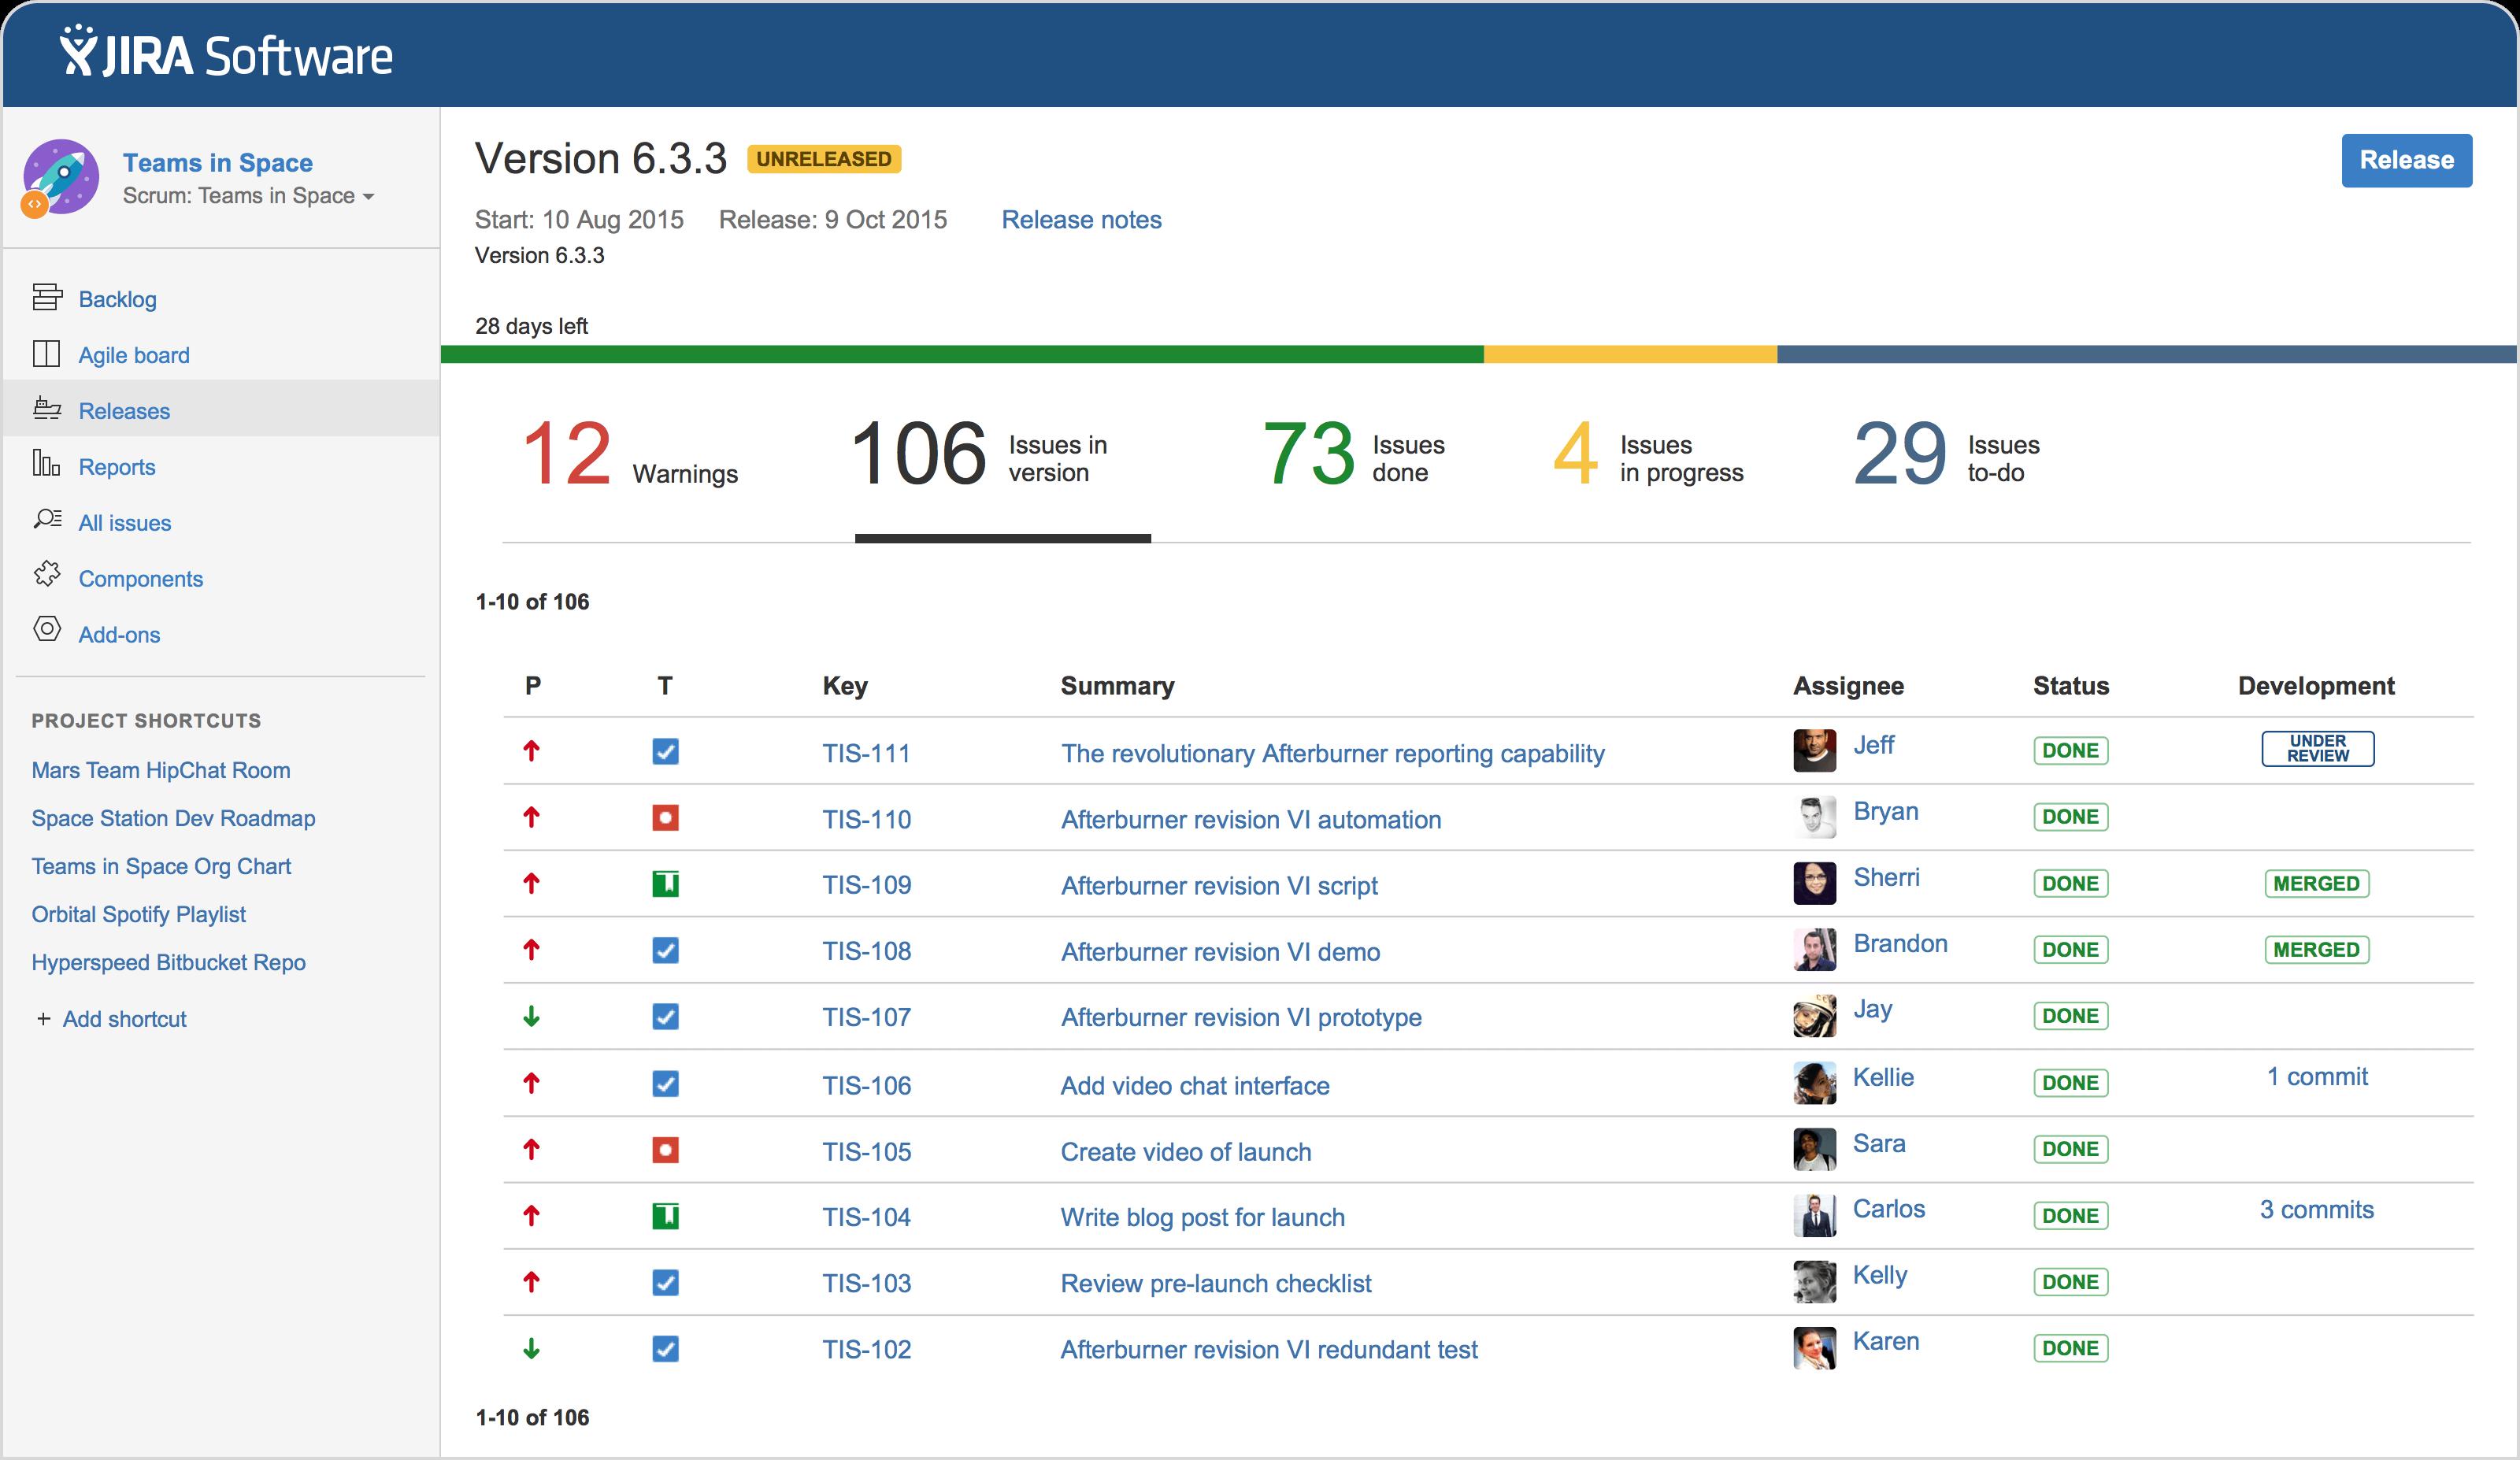 ferramenta de gerenciamento de projeto-jira-software-entrega